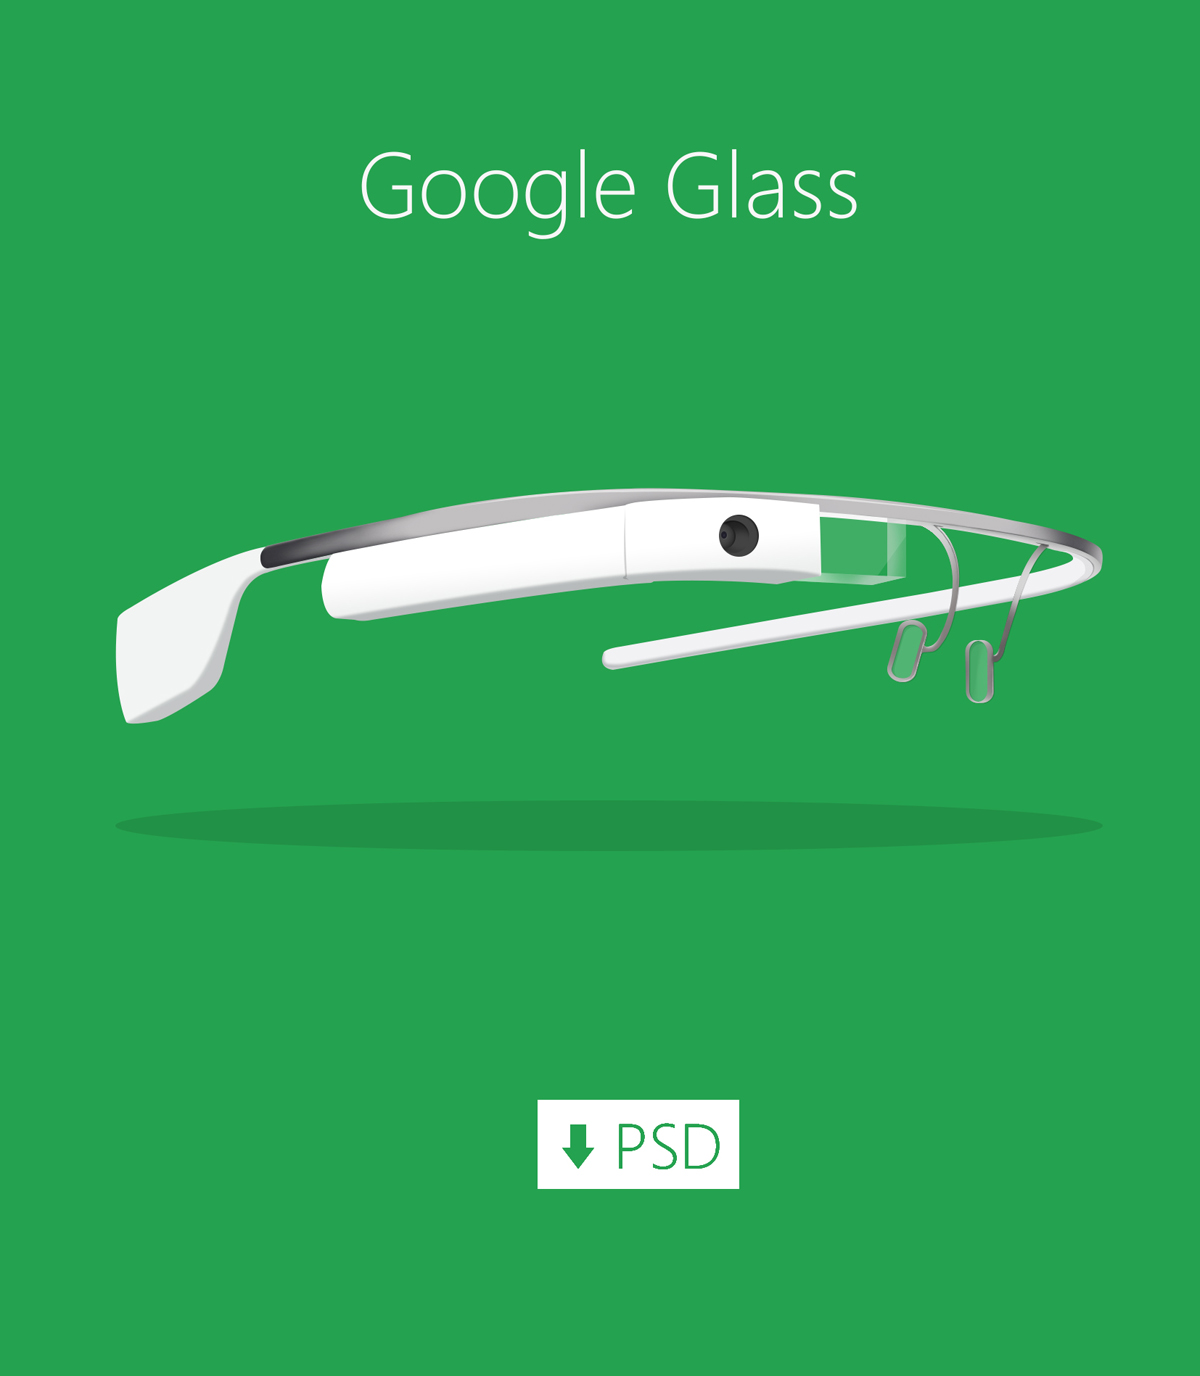 Freebie-Cool Google Glass PSD